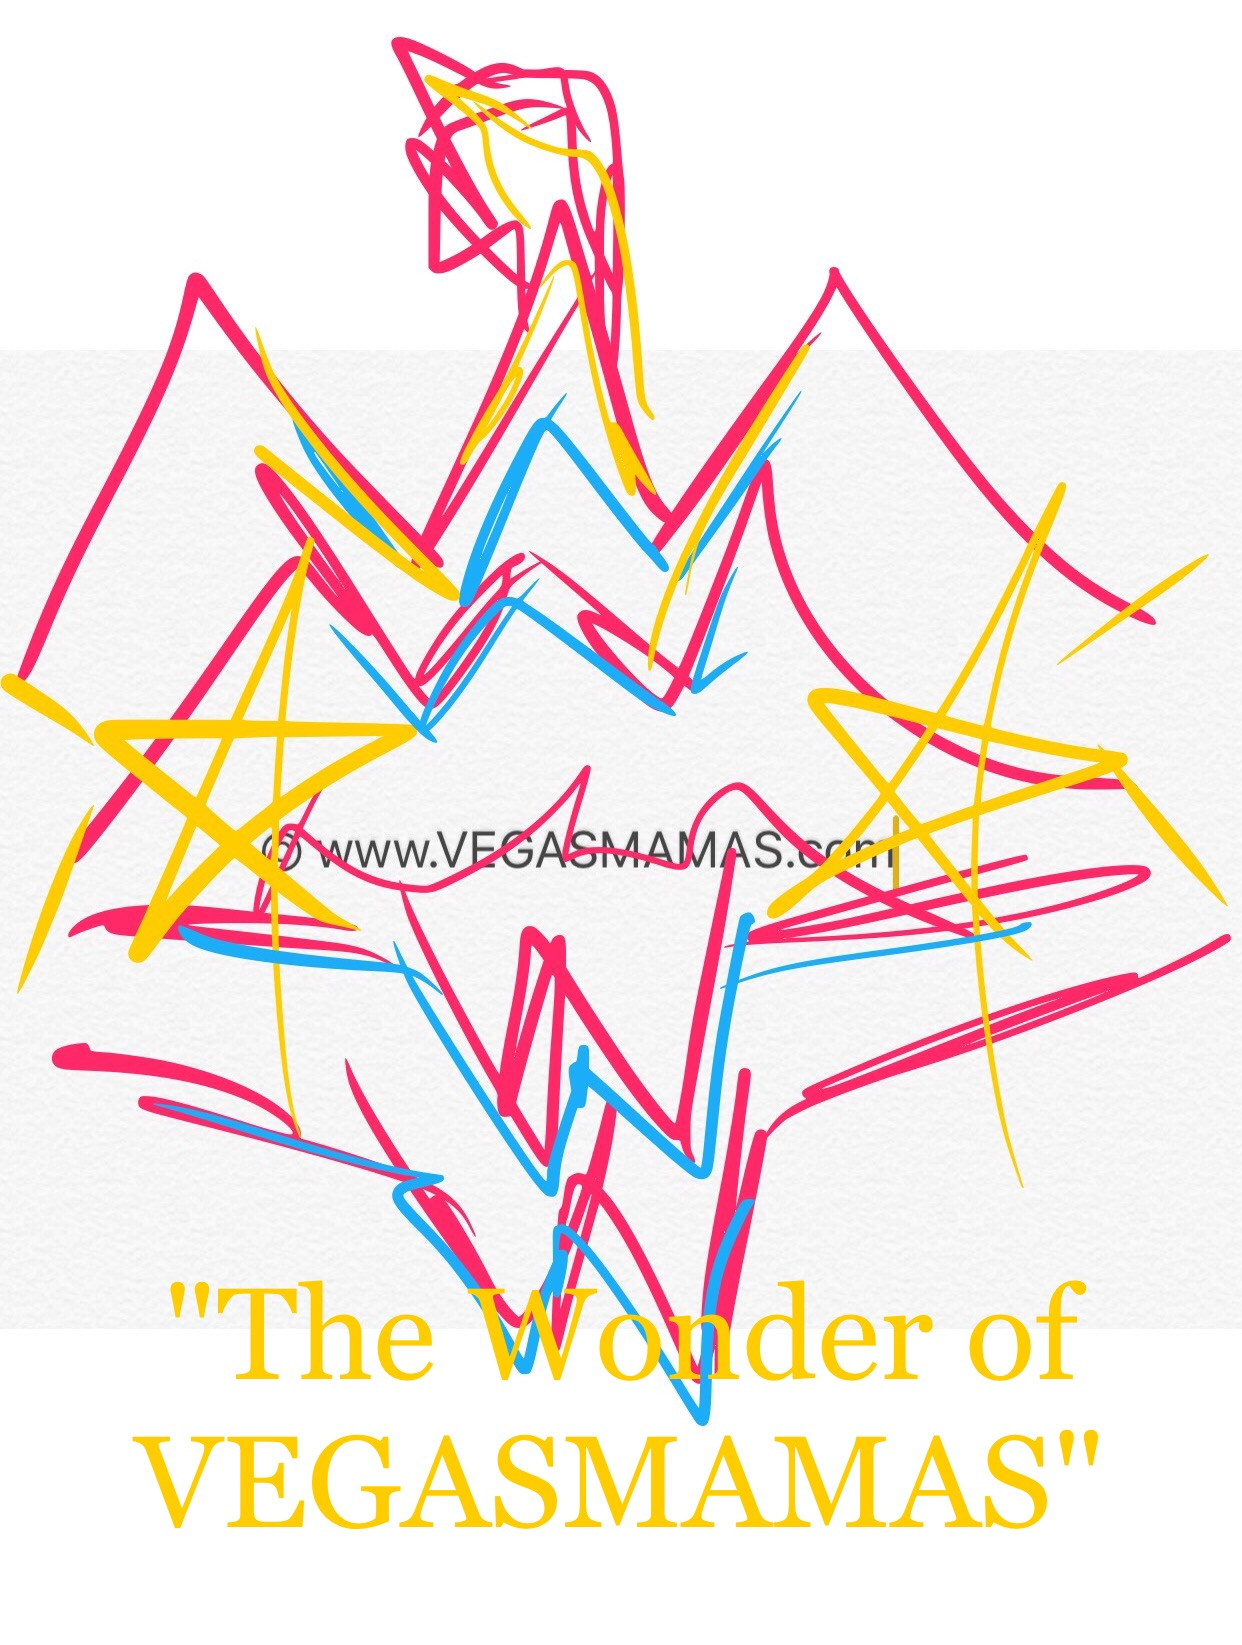 THE WONDER OF VEGASMAMAS.jpg